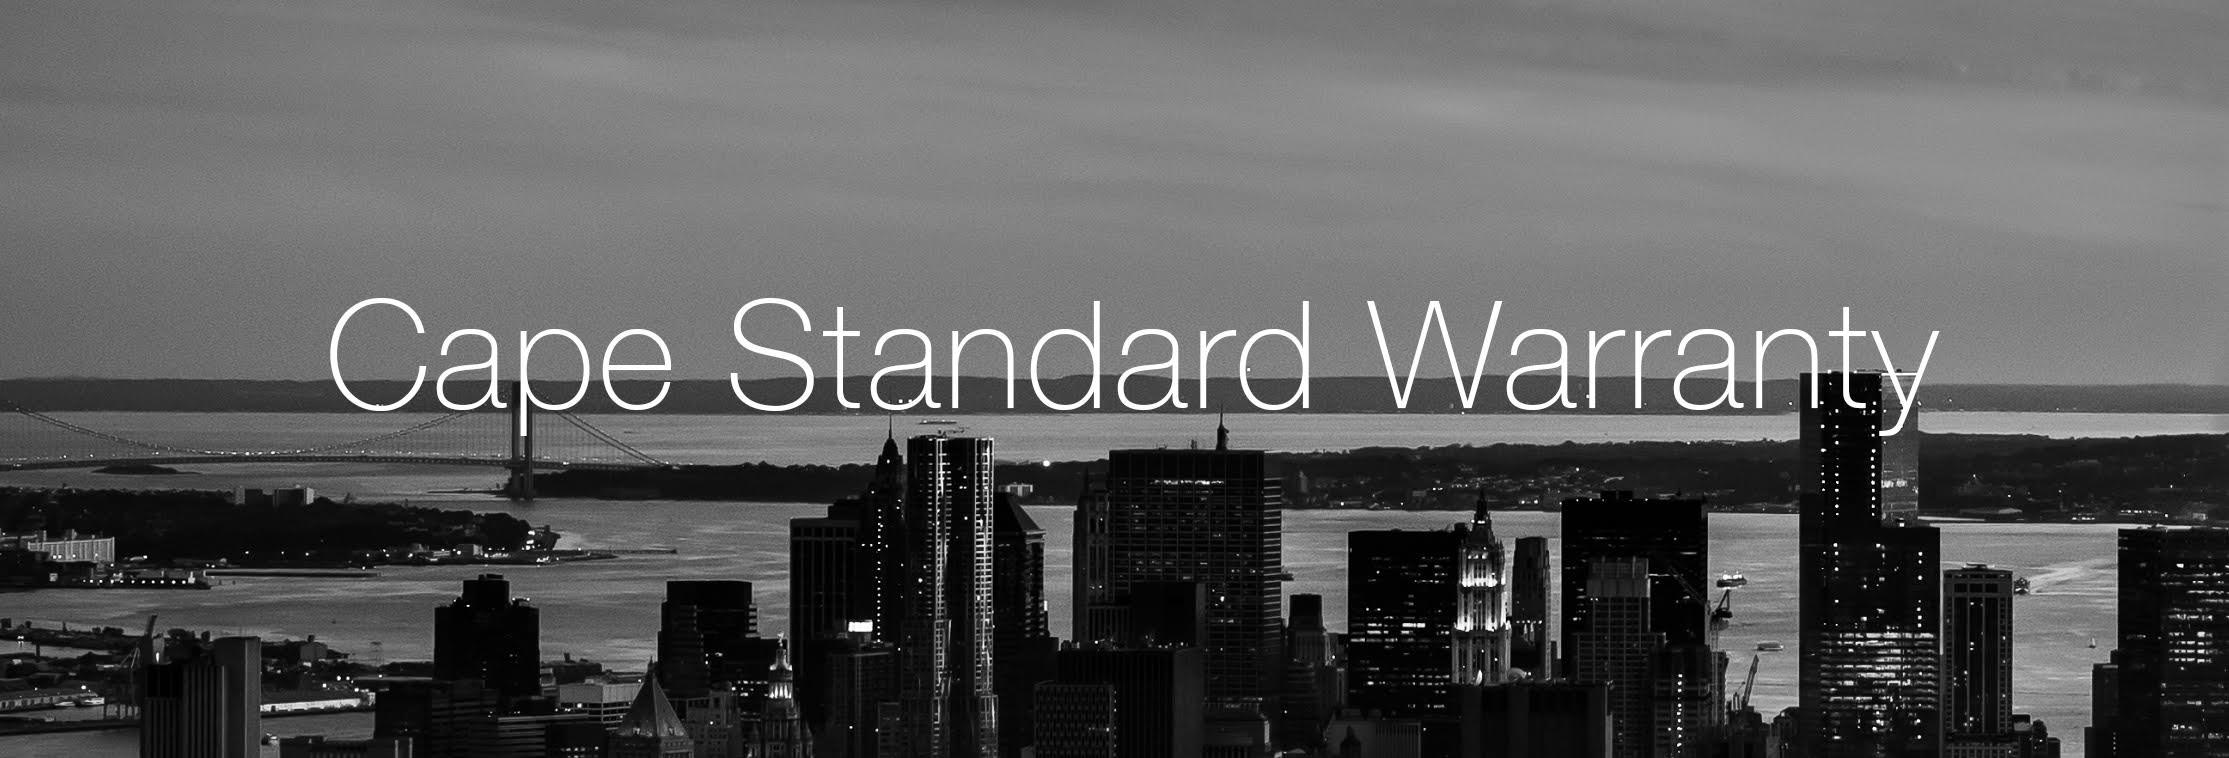 cape-standard-warranty-header